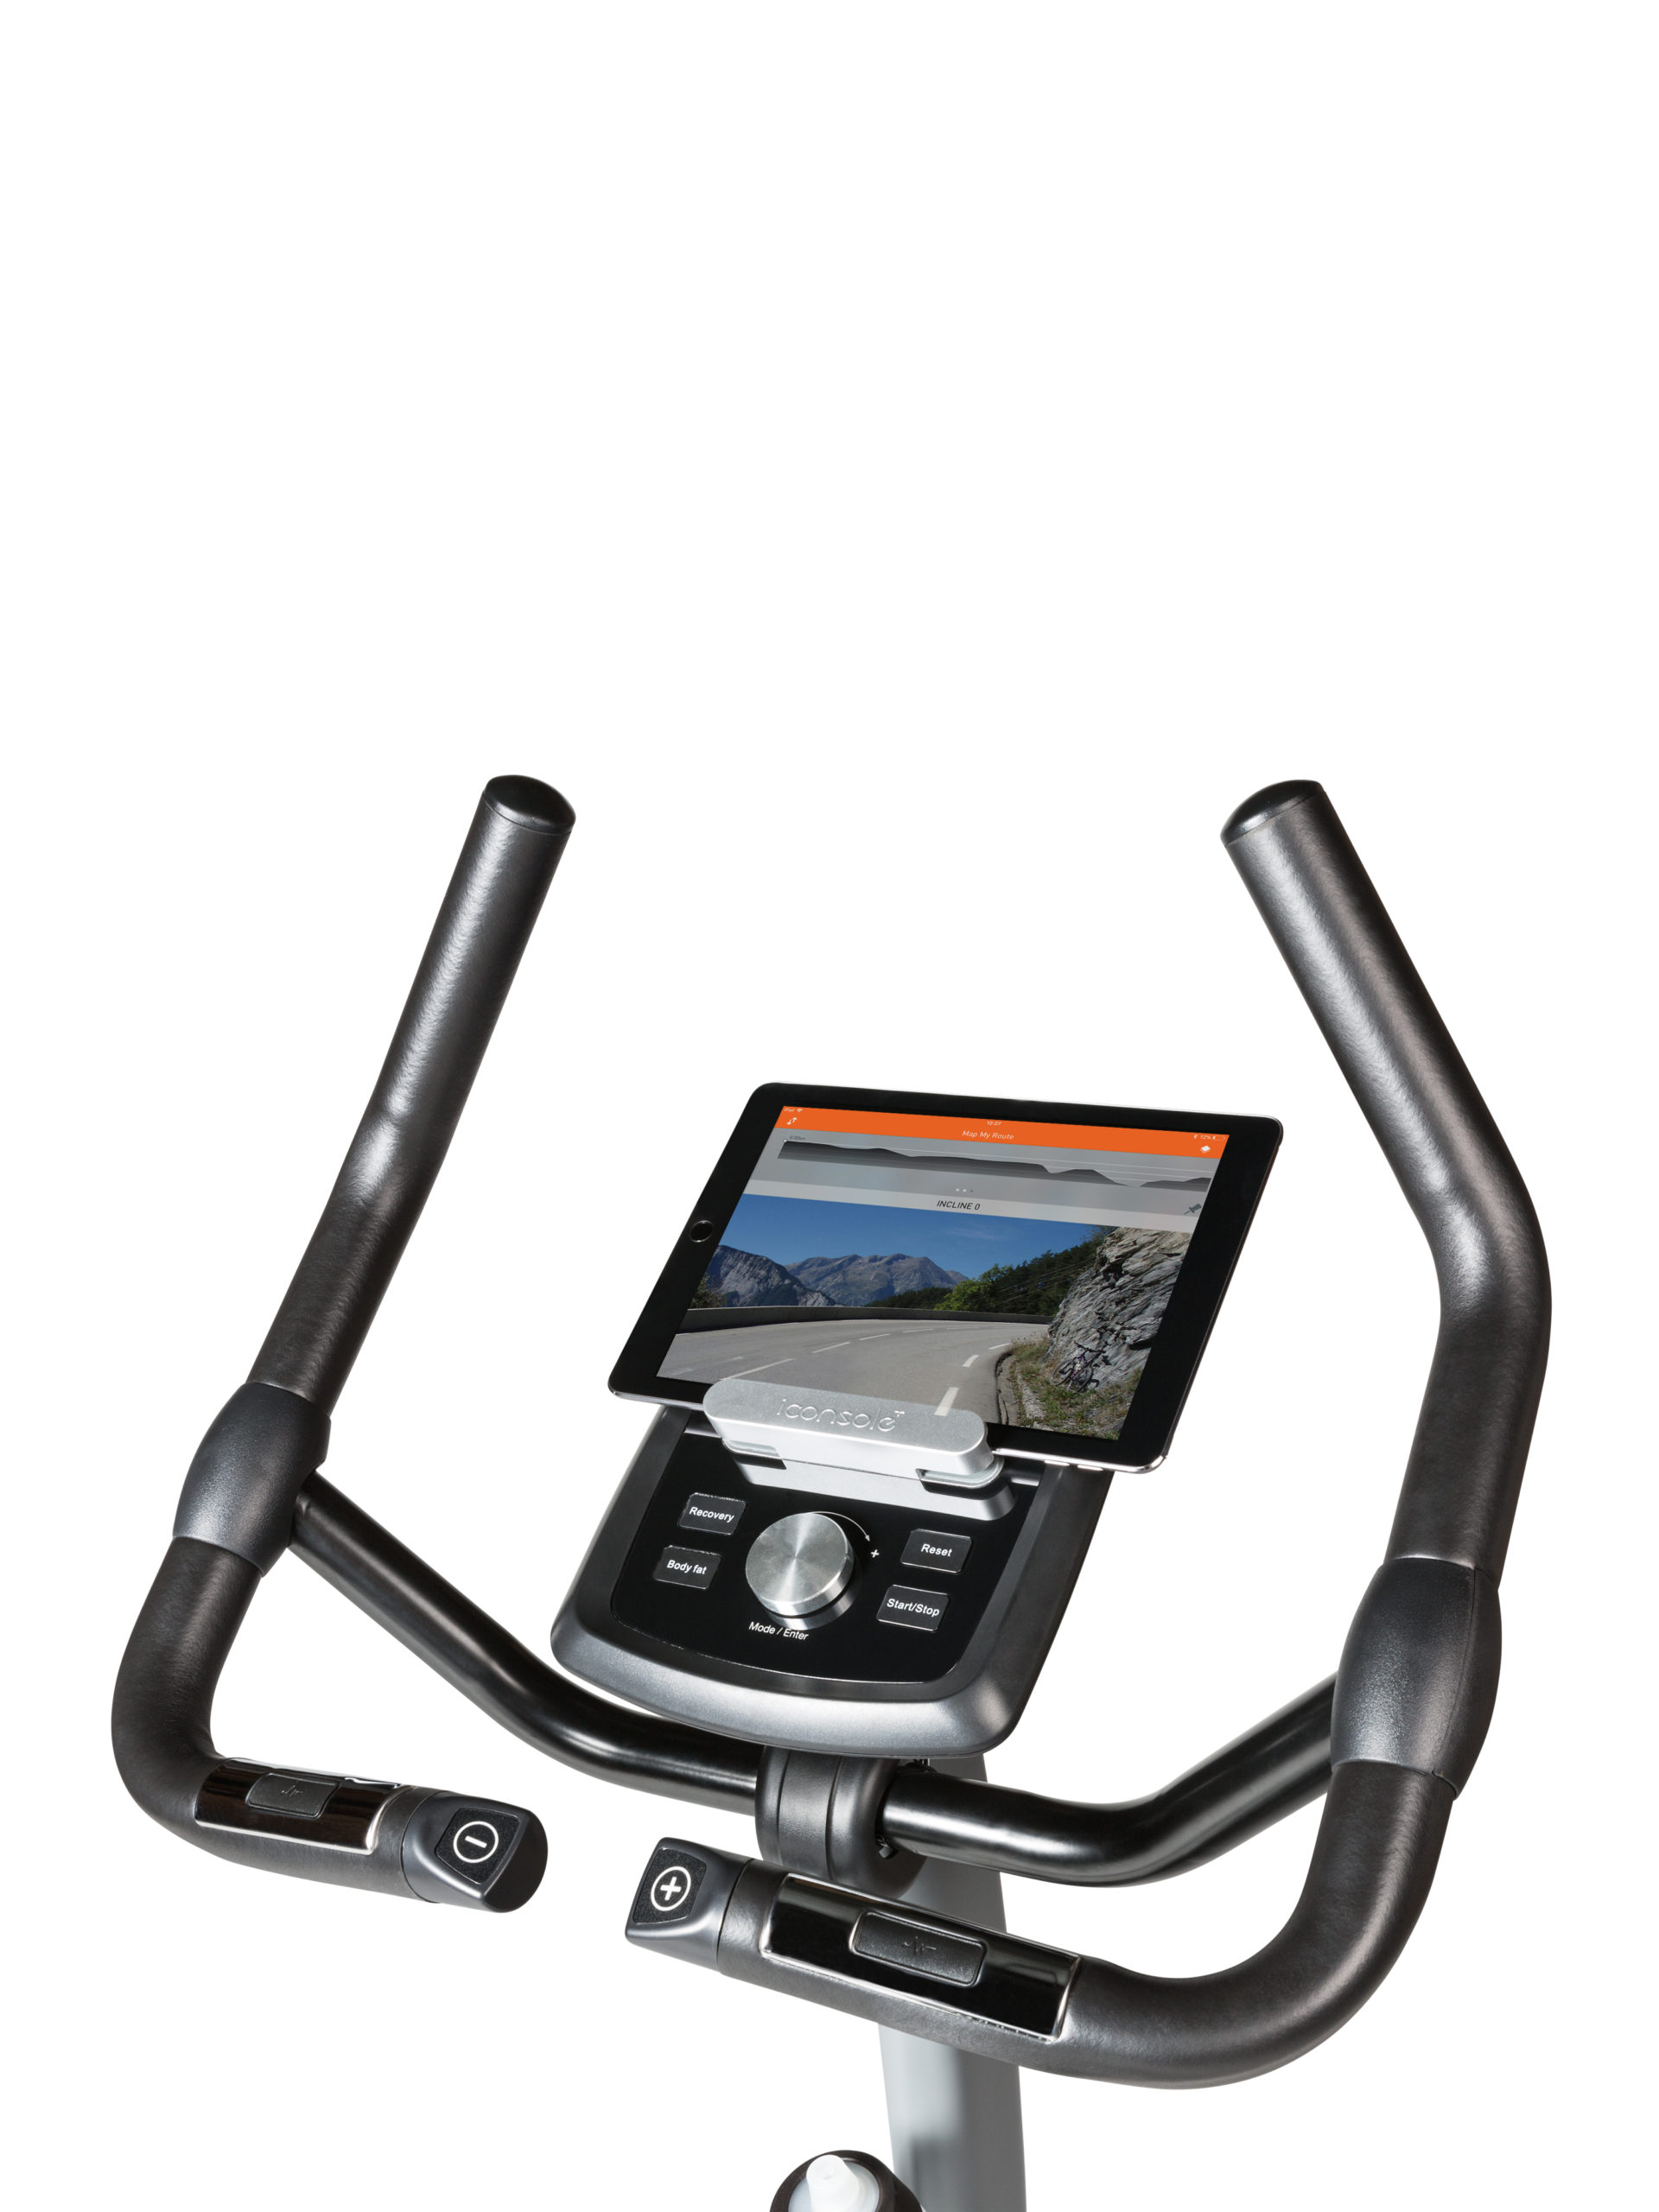 Flow Fitness Tabel Turner DHT2000i Hometrainer 7